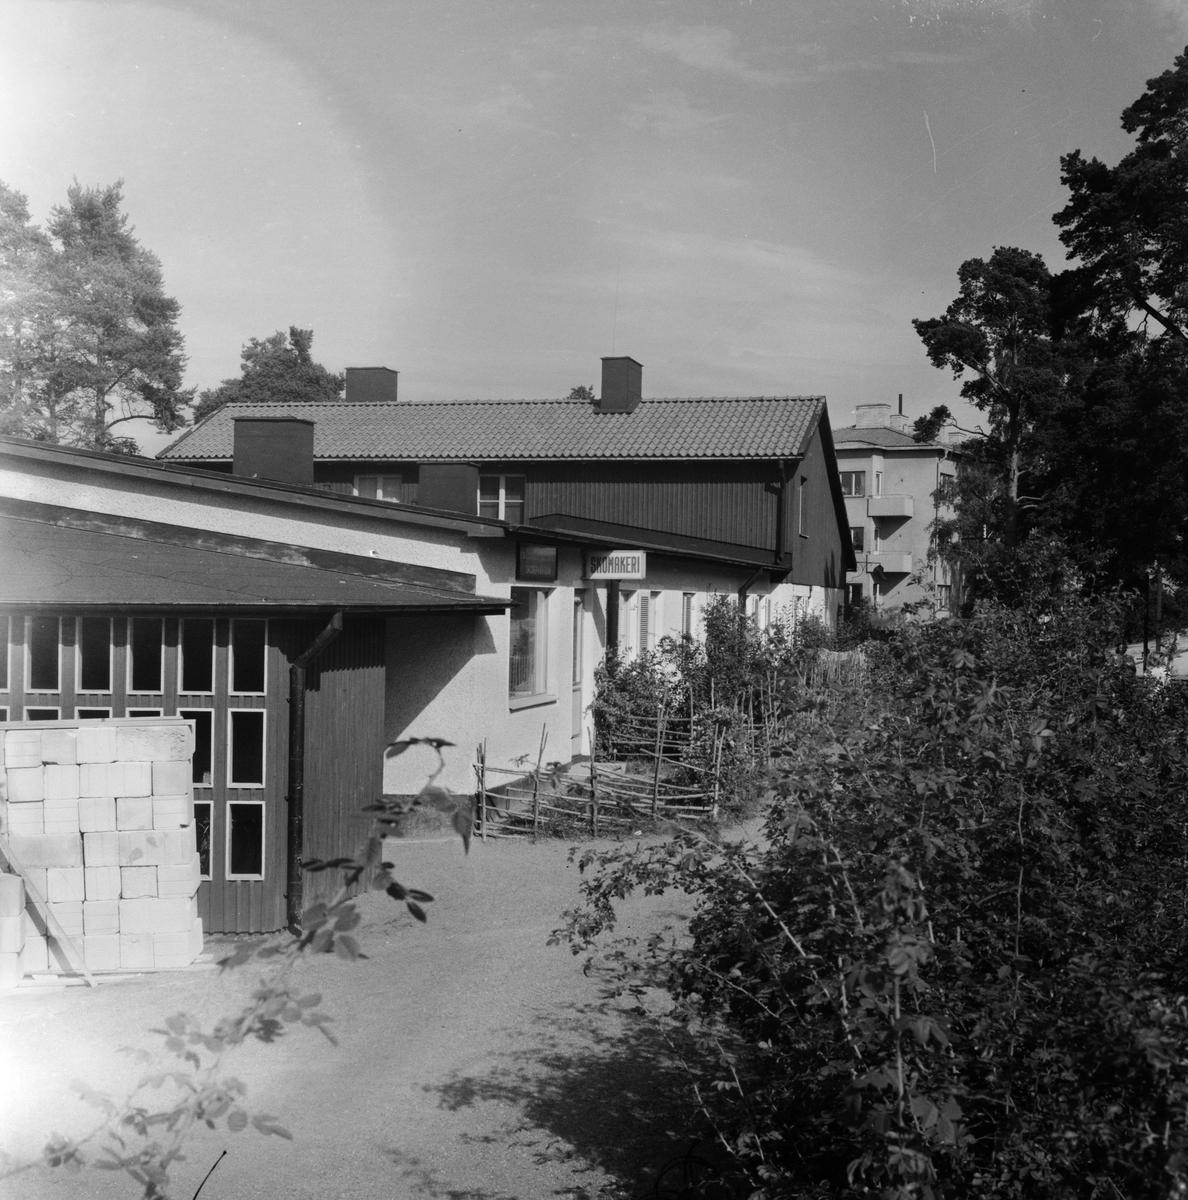 Bostadshus och skomakeri vid Gustavsbergsgatan, kvarteret Gustavsberg i Eriksberg, Uppsala